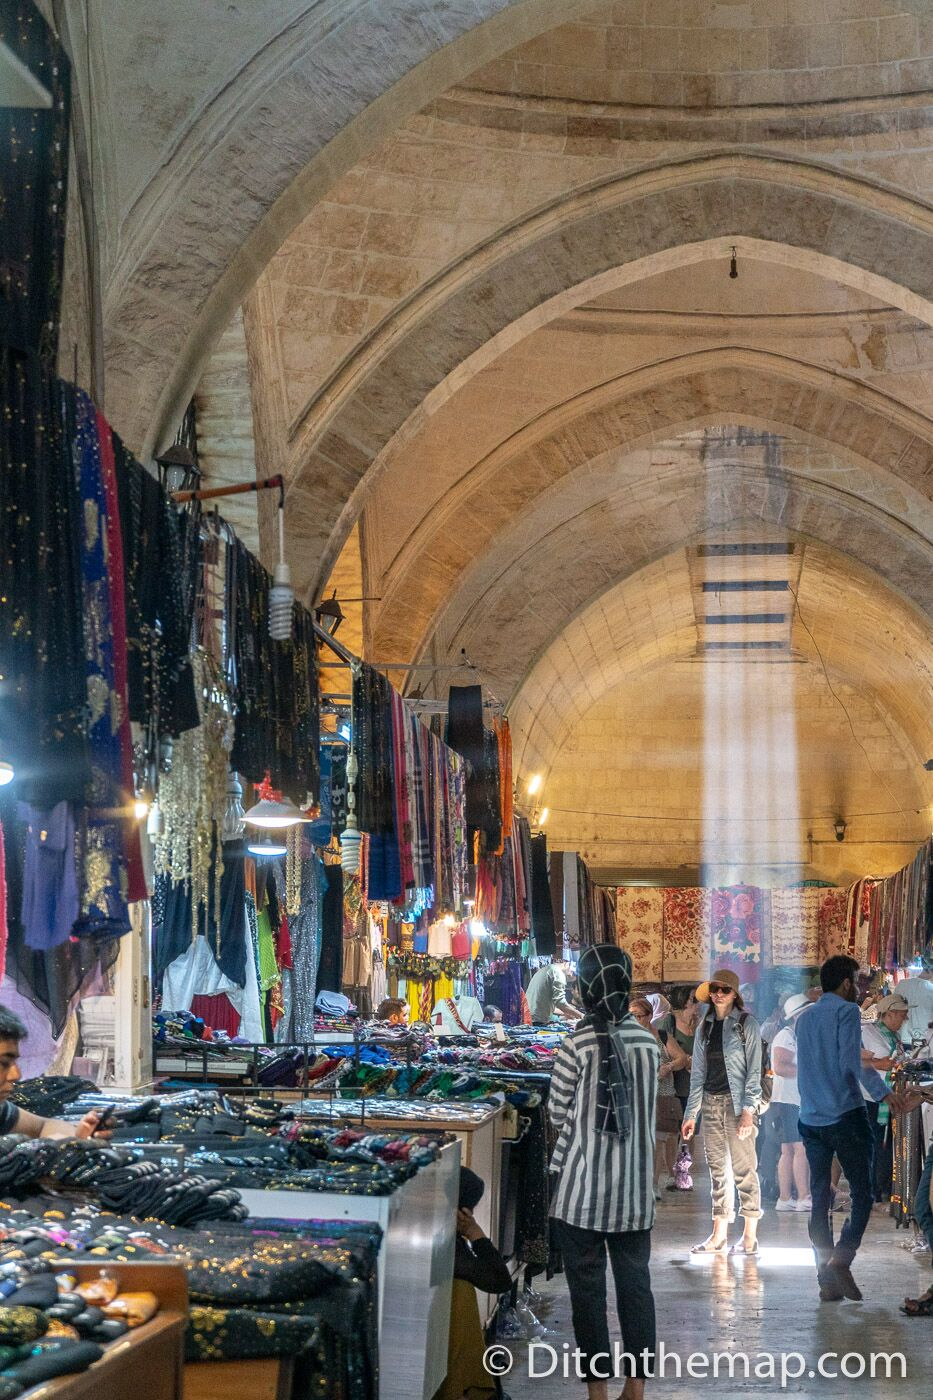 Venders inside the Gumruk Bazaar in Sanliurfa, Turkey